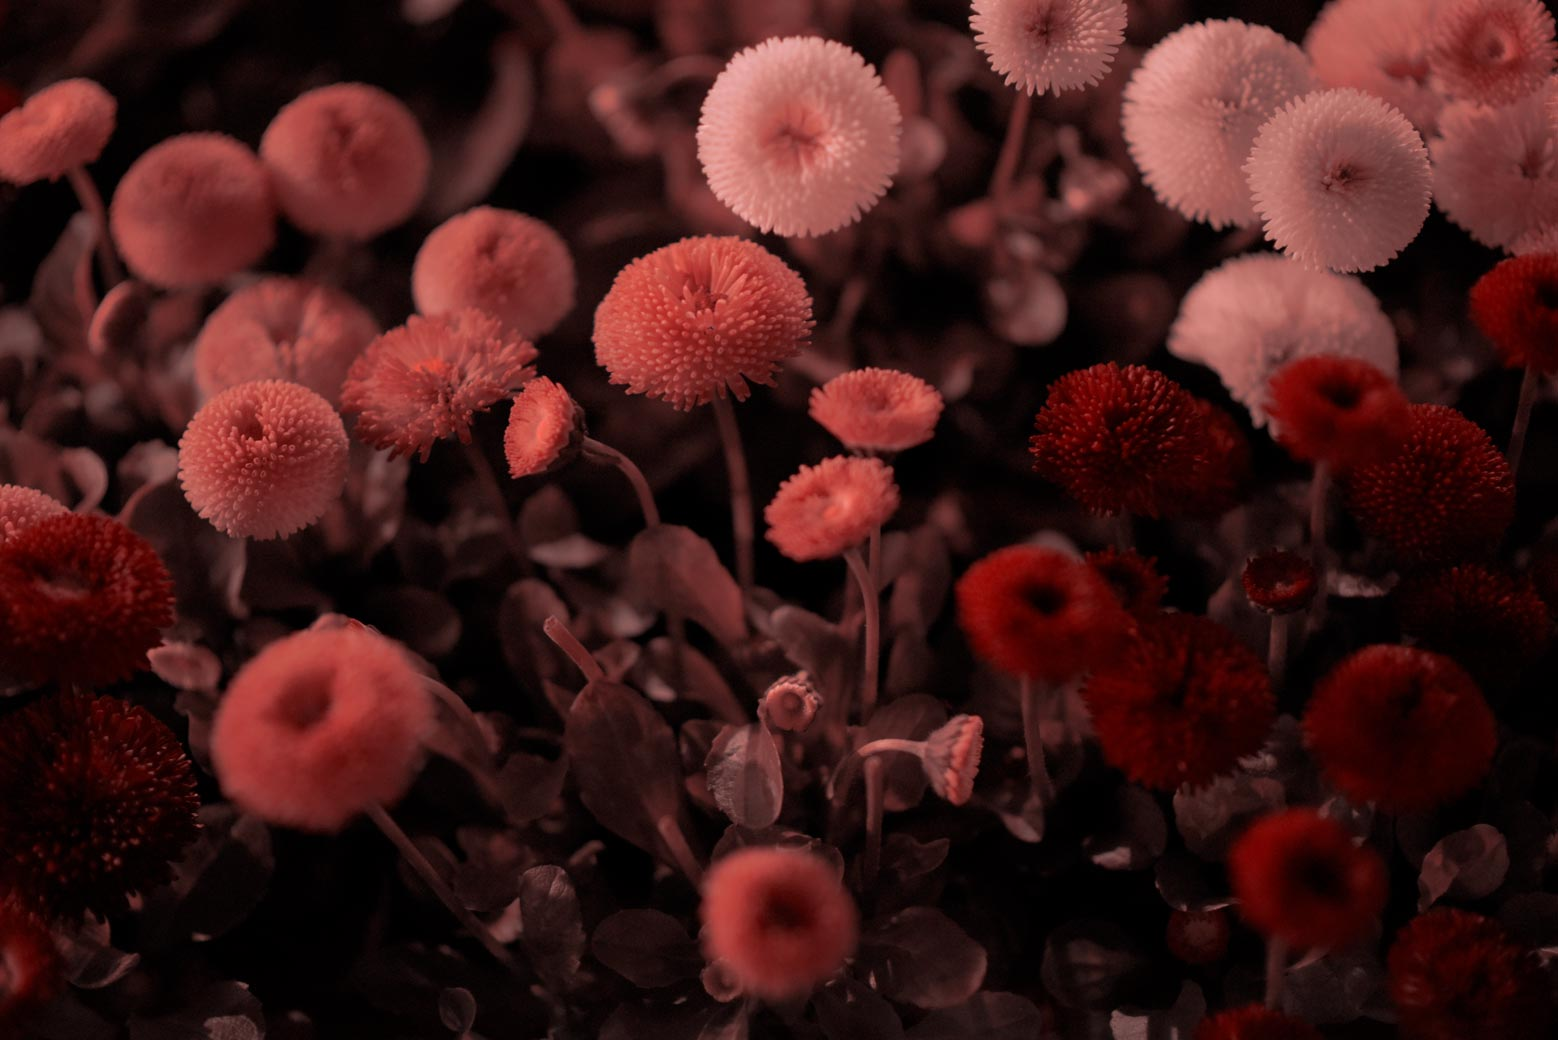 © AristoVopĕnka (Brussels, Belgium) | Night Flower 3